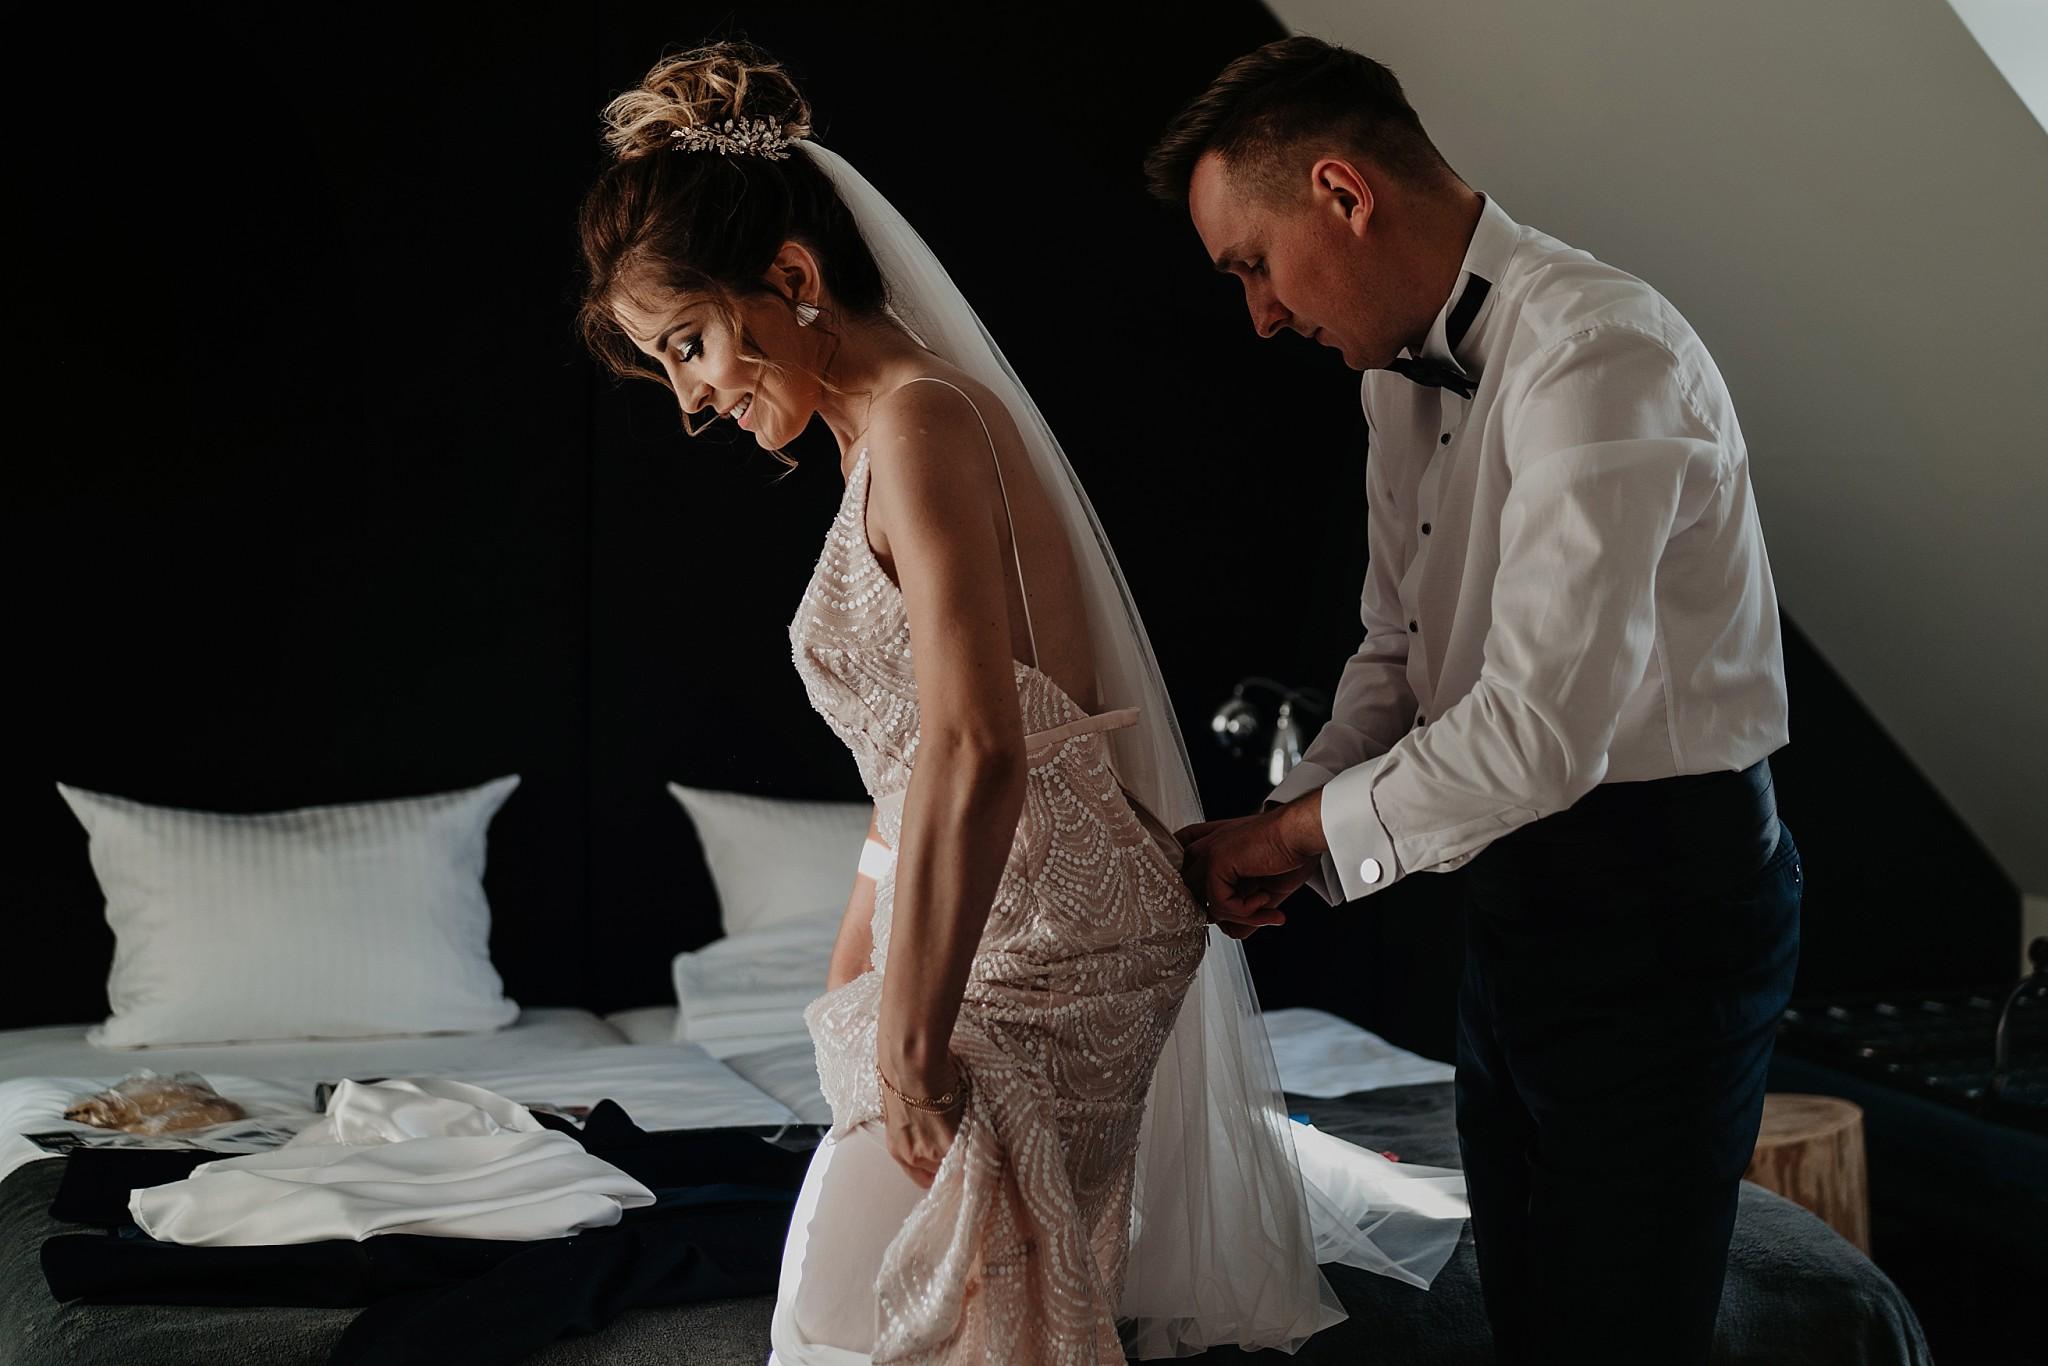 fotograf poznan wesele dobra truskawka piekne wesele pod poznaniem wesele w dobrej truskawce piekna para mloda slub marzen slub koronawirus slub listopad wesele koronawirus 071